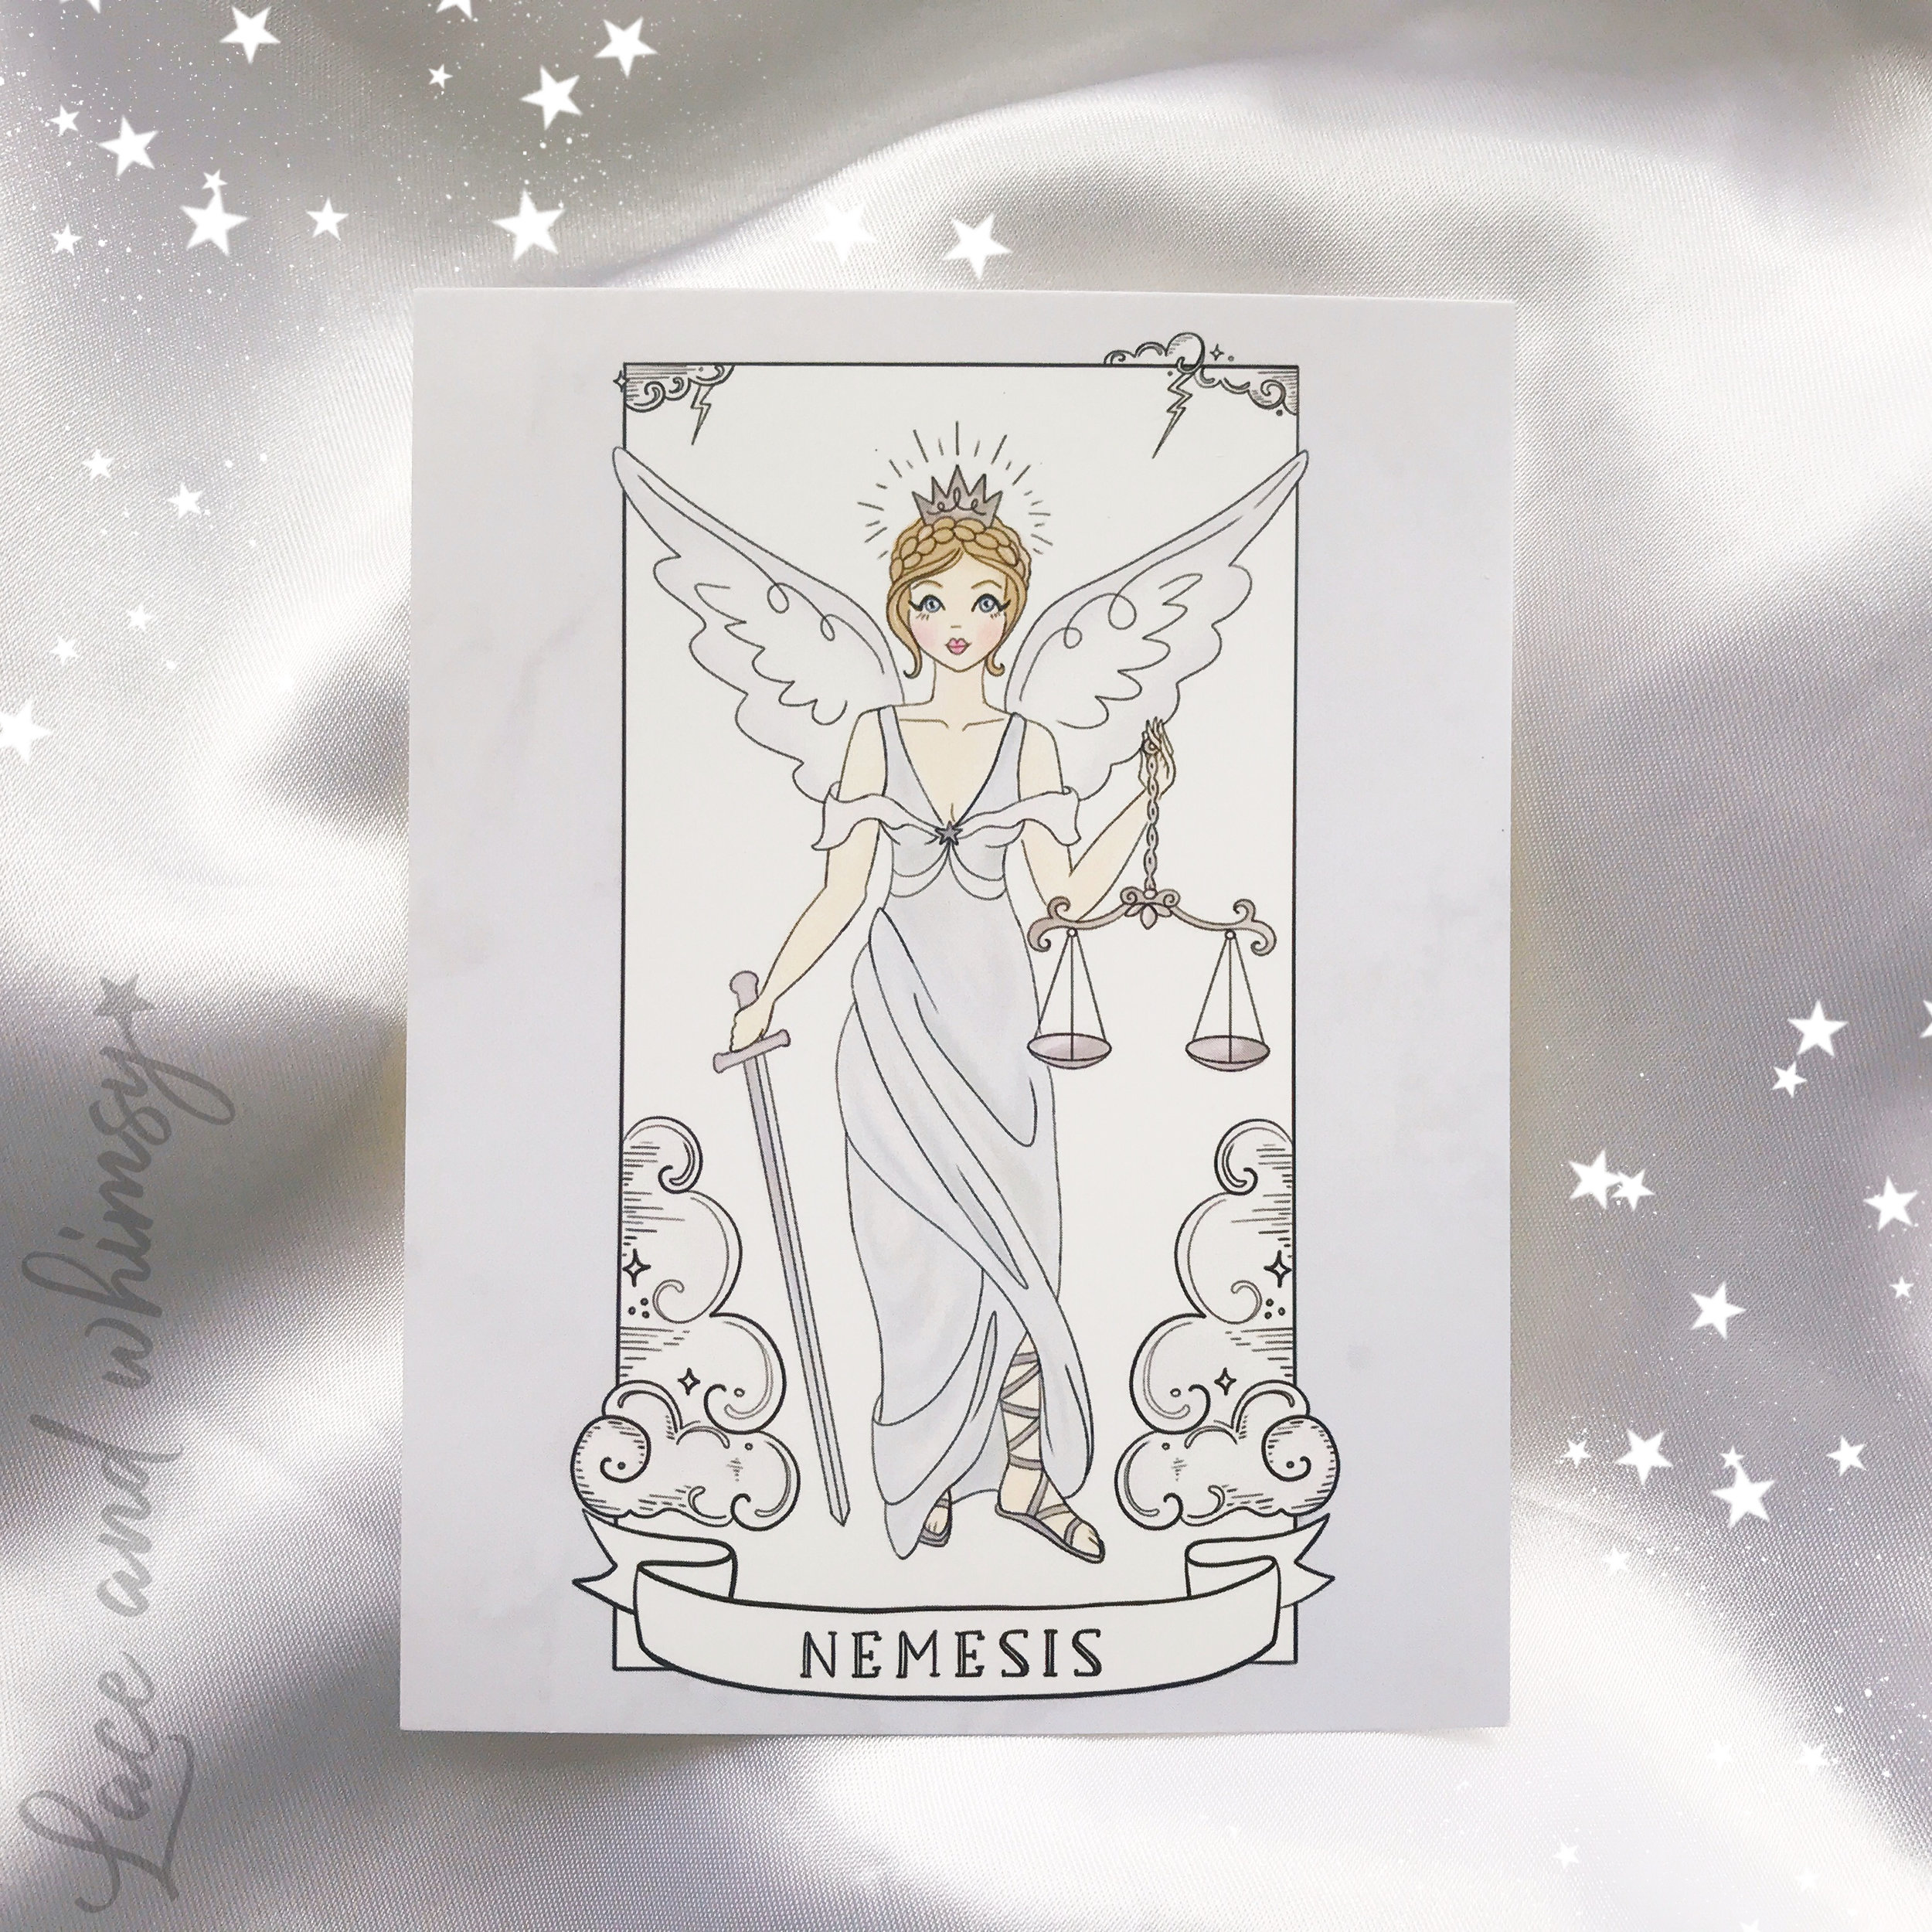 Nemesis - goddess of divine retribution.